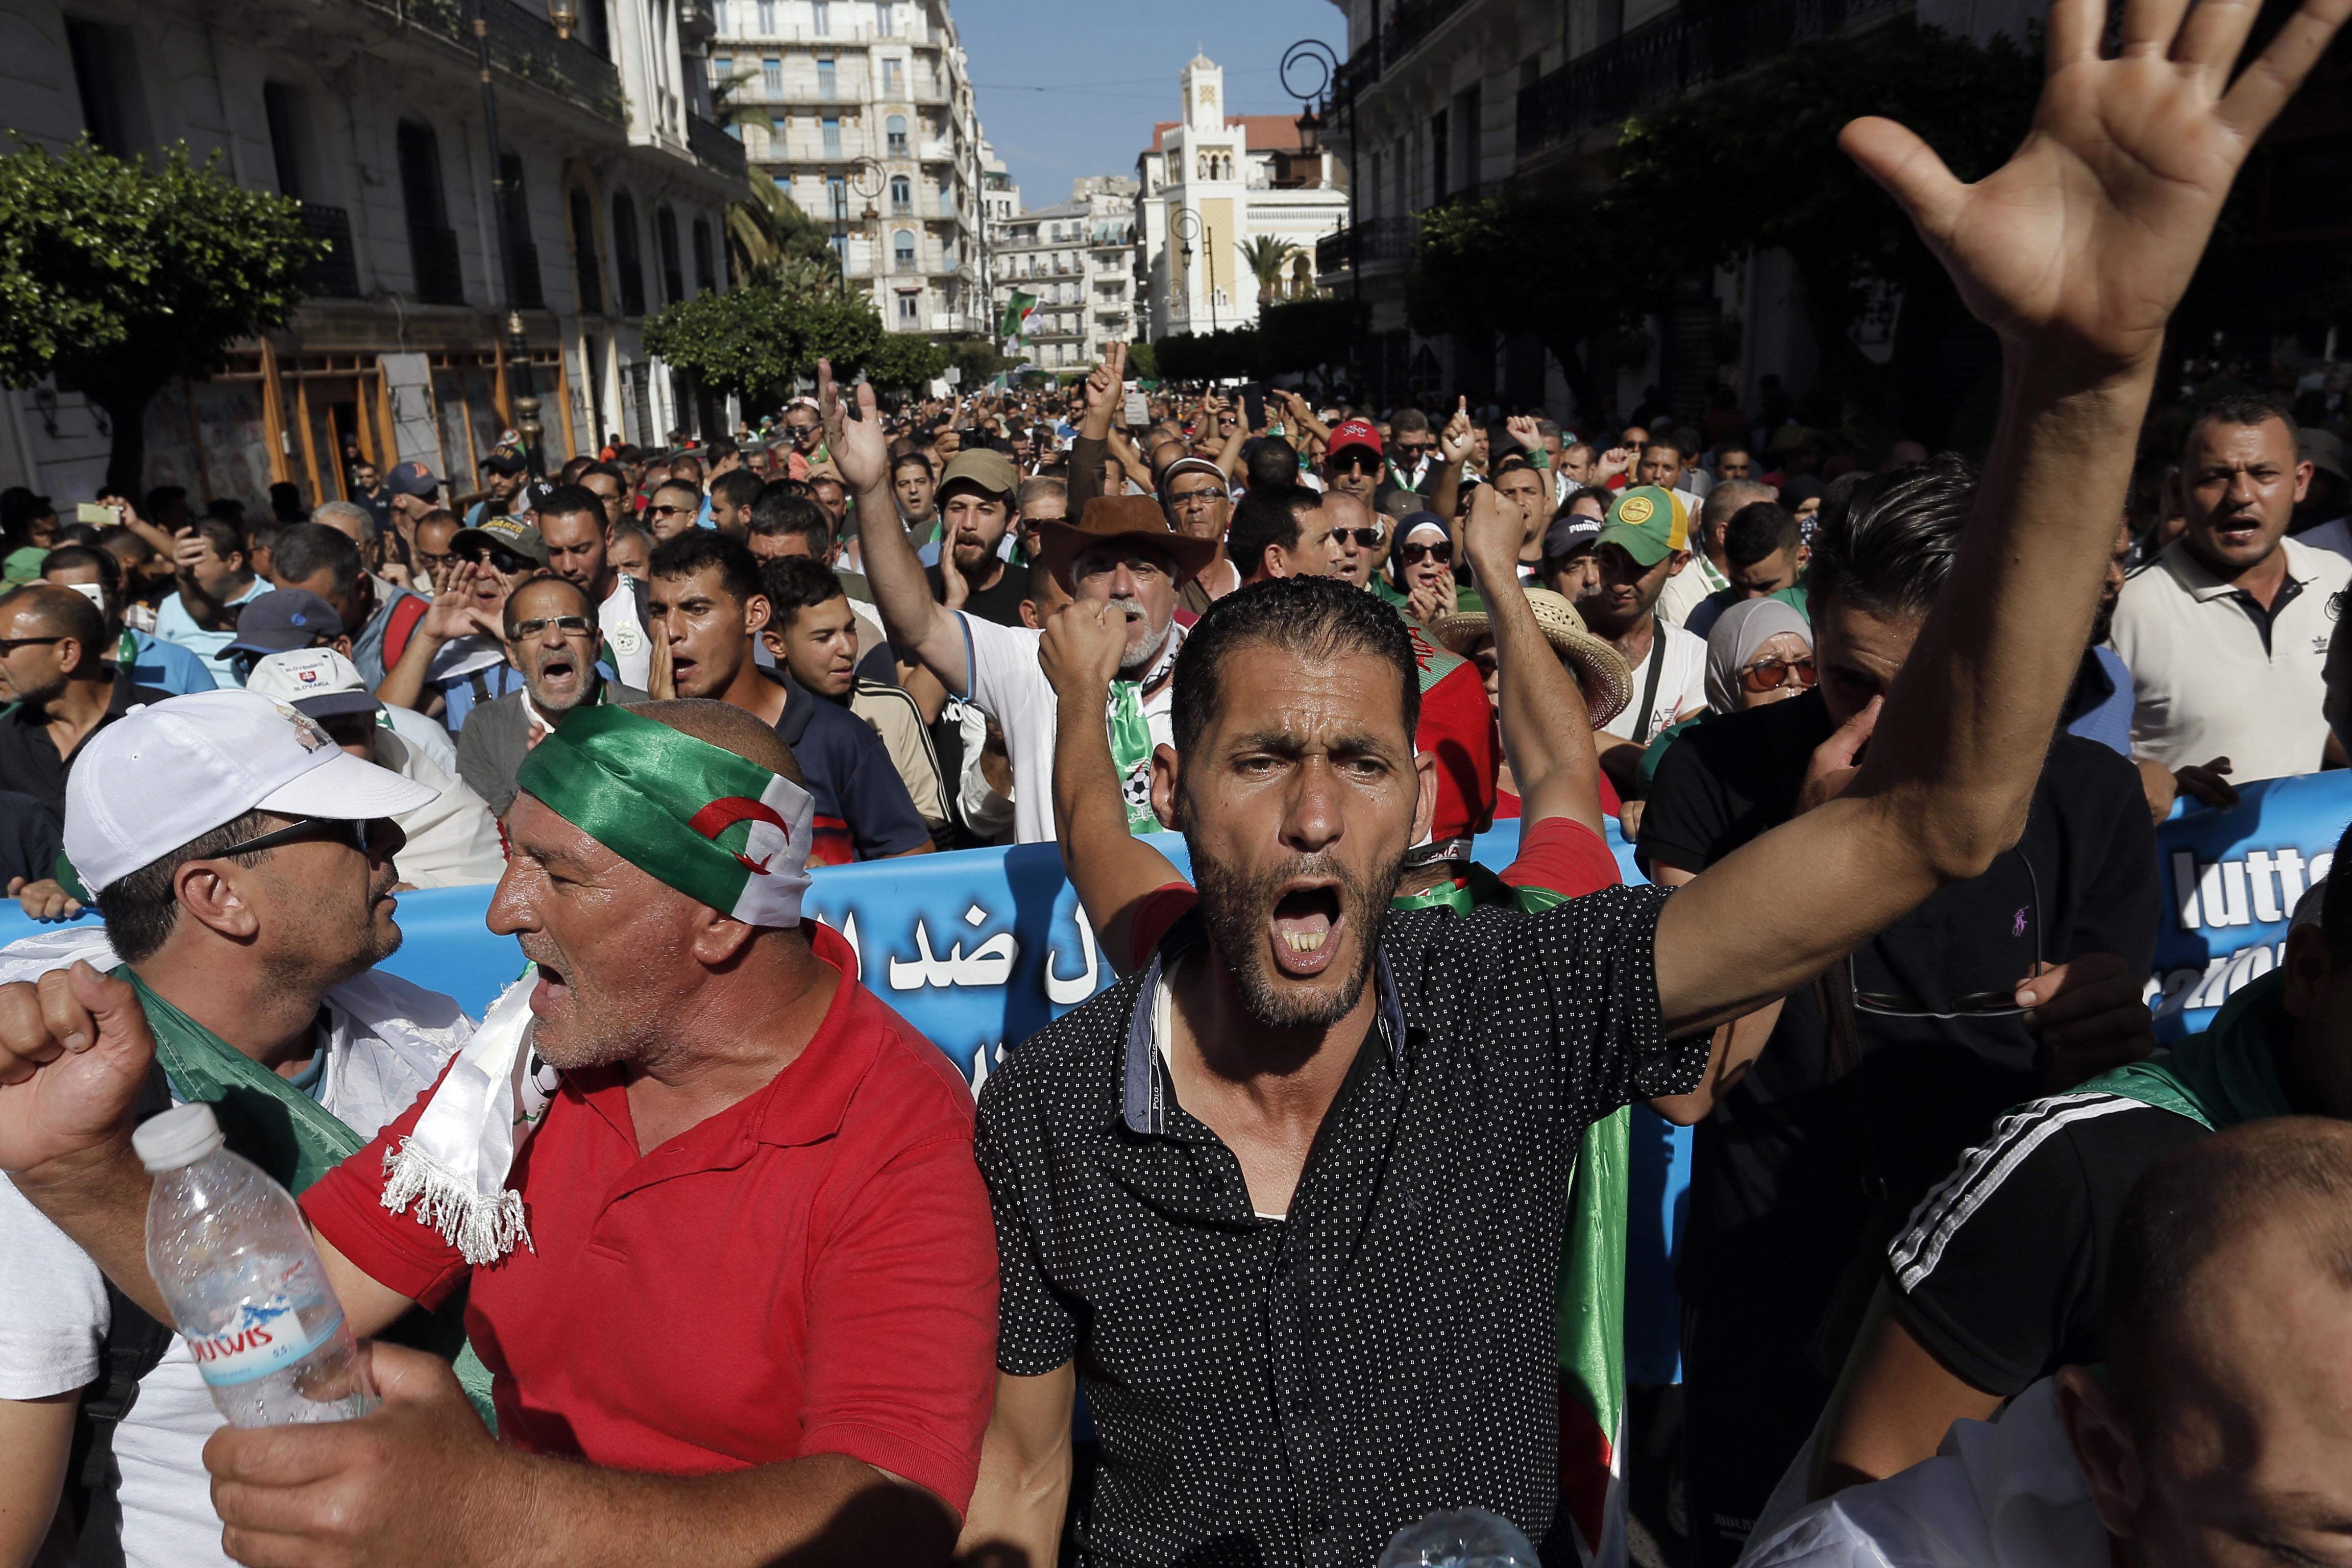 Des manifestants dans les rues d'Alger, vendredi 11 octobre 2019.